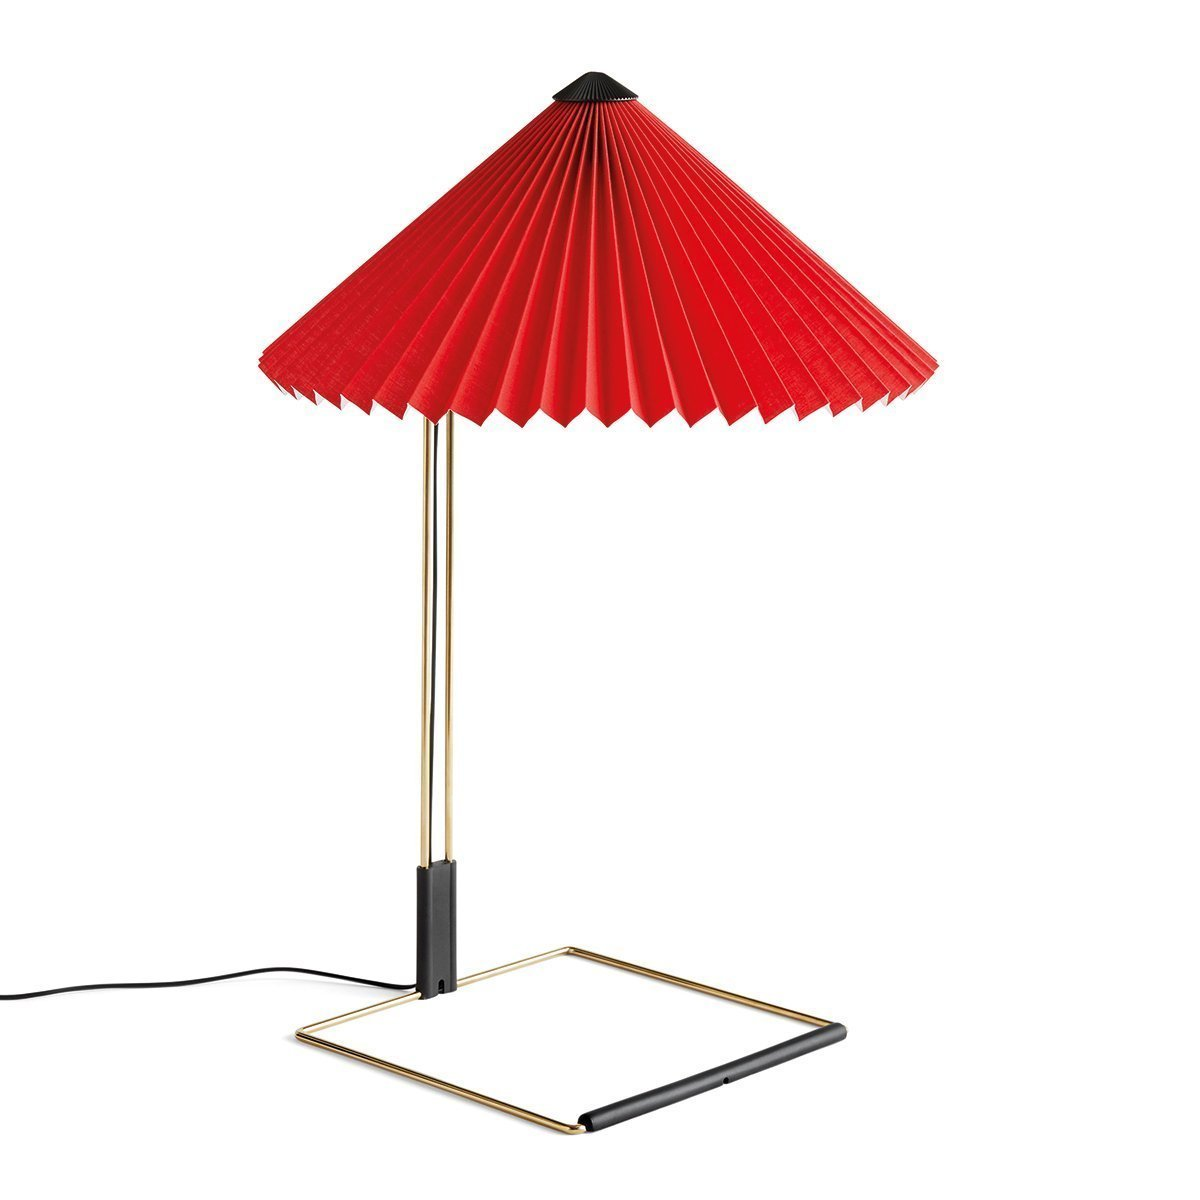 HAY Matin Tafellamp - Large - Bright Red